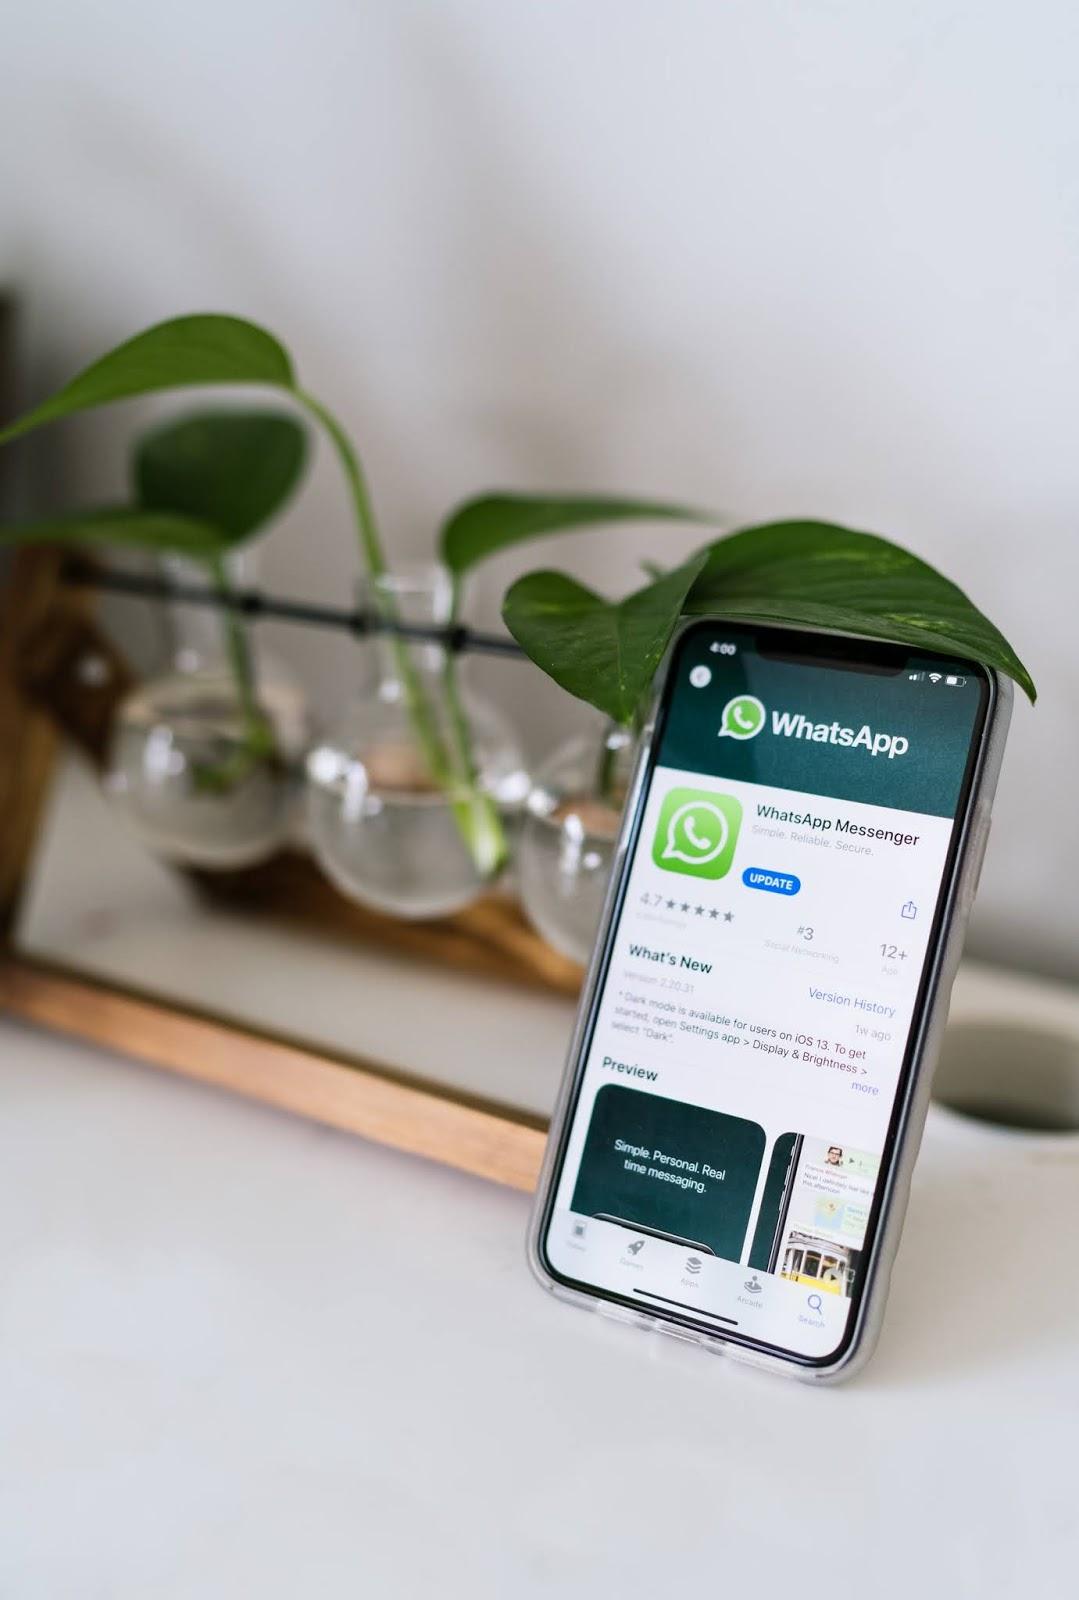 Cara Mudah Balas Pesan WhatsApp Tanpa Ketahuan Online